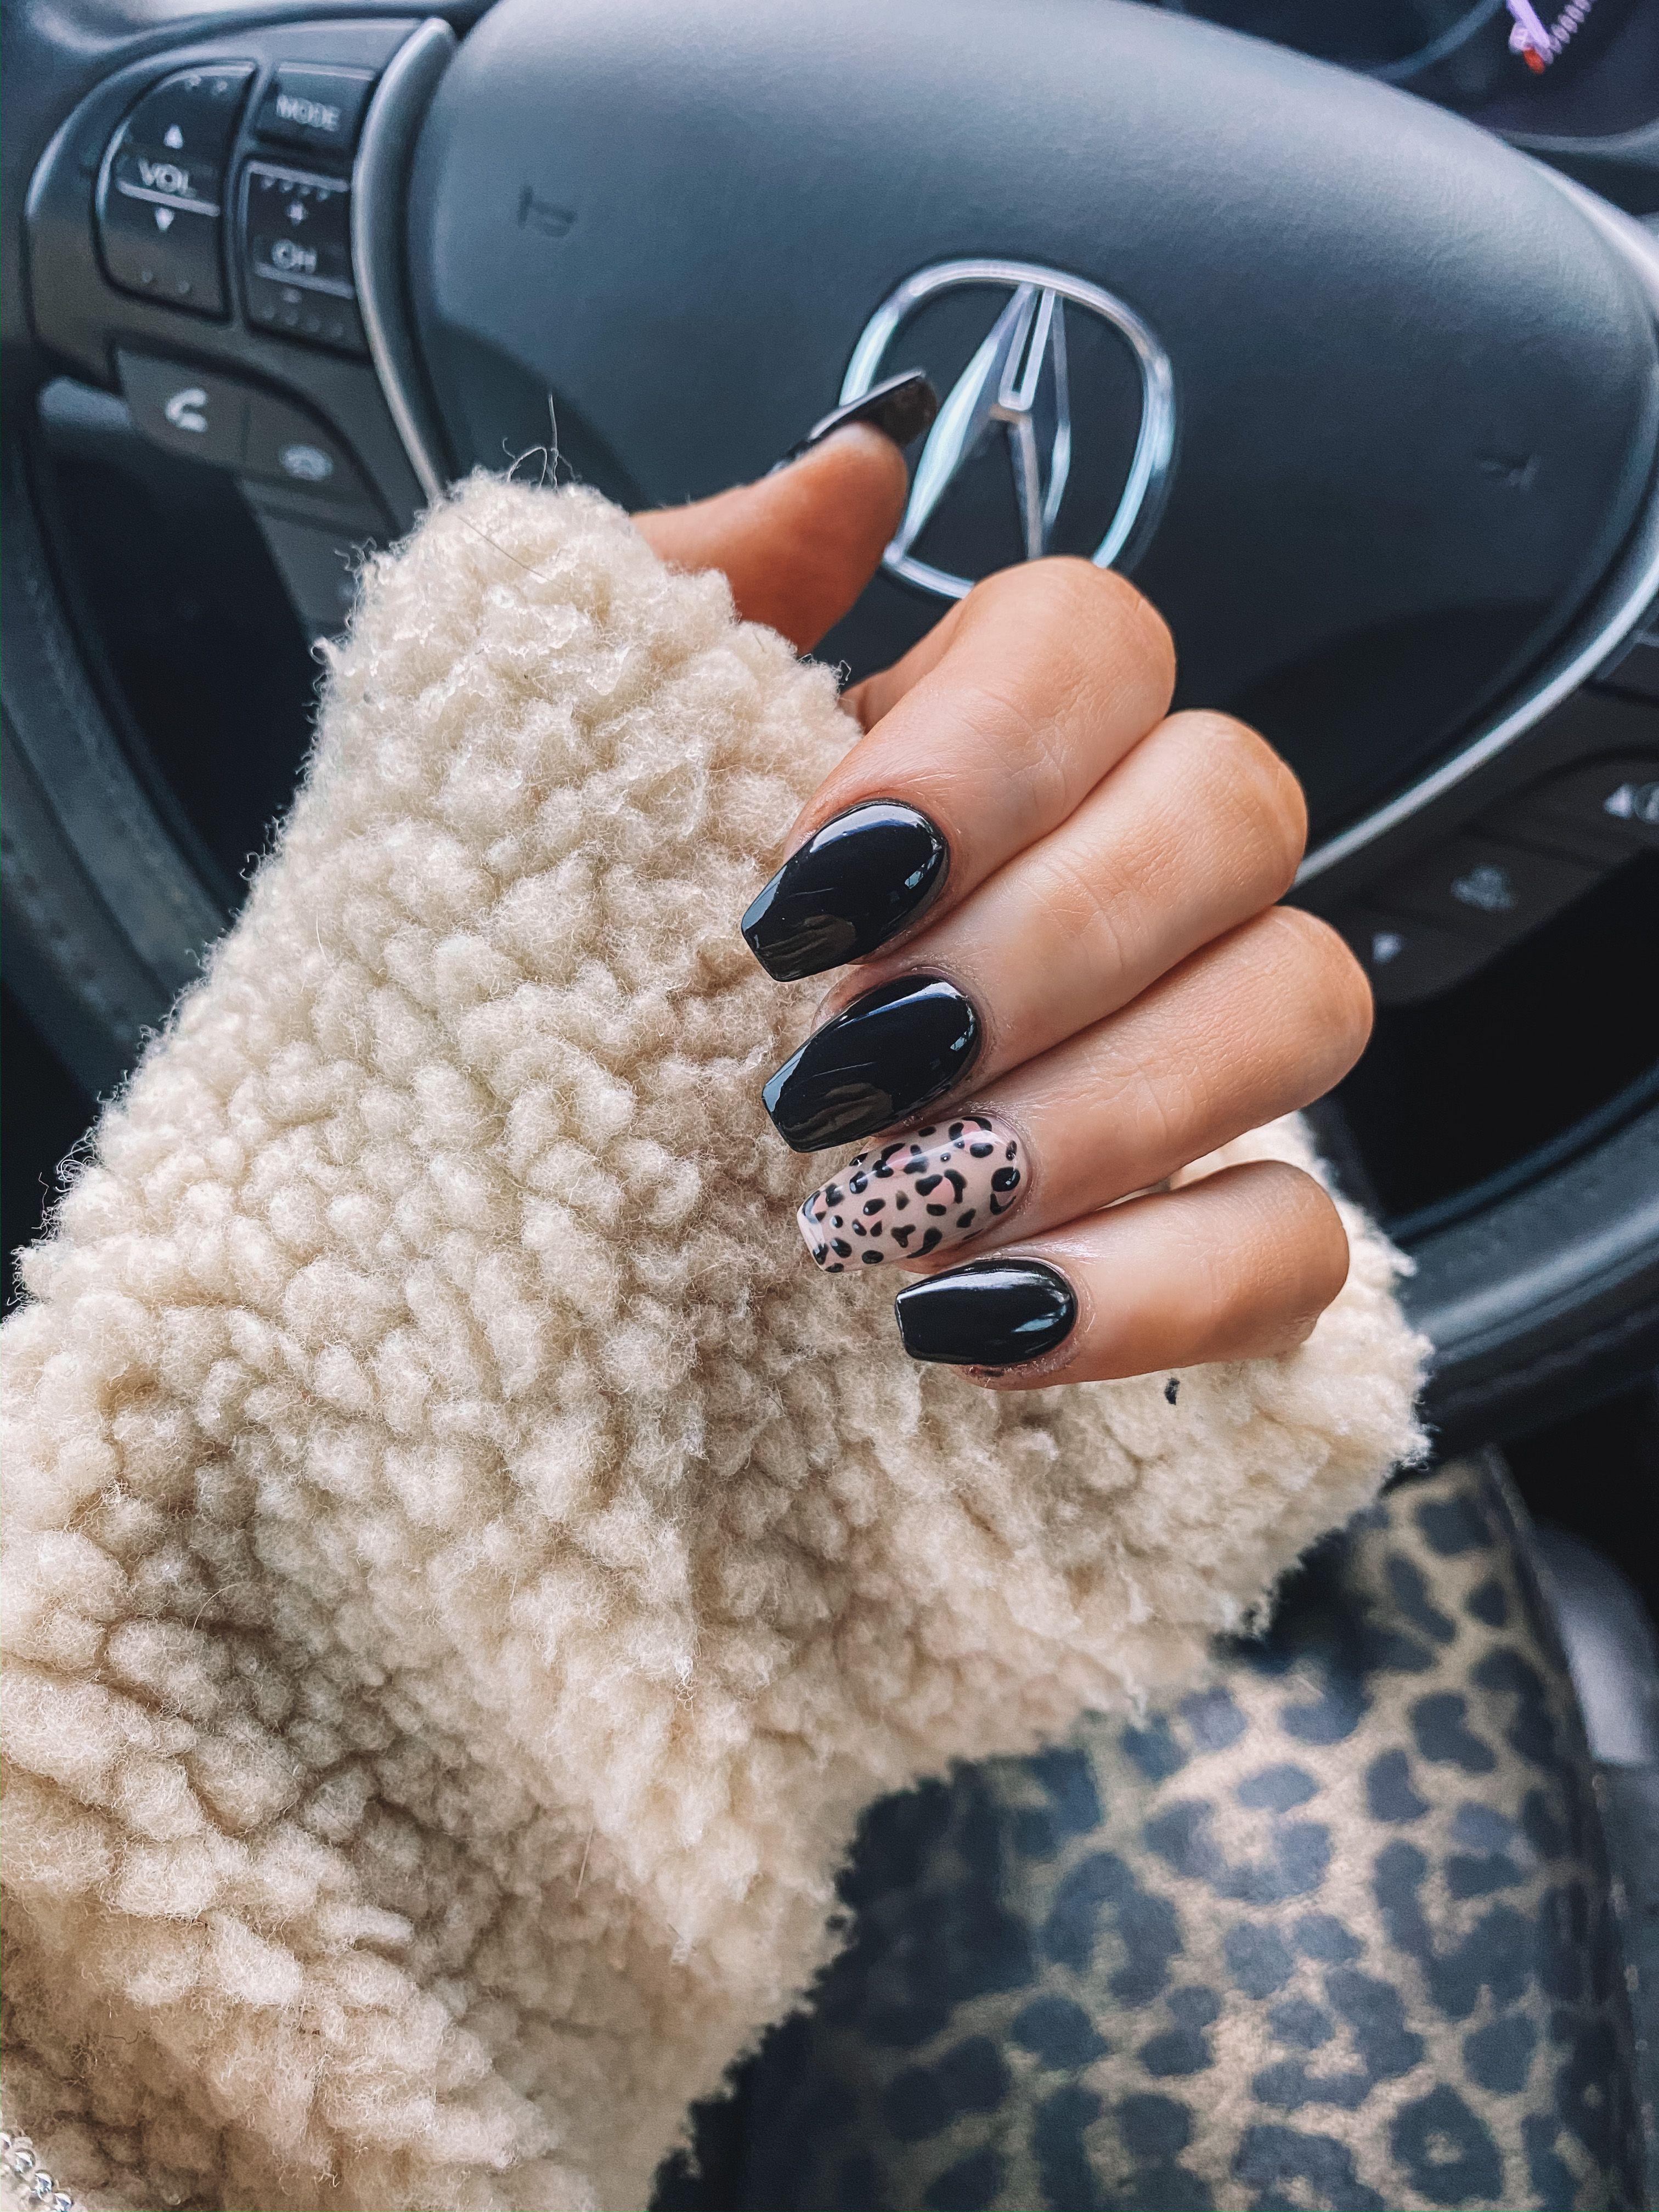 Leopard Nail Print Black Nails In 2020 Cheetah Print Nails Fire Nails Best Acrylic Nails